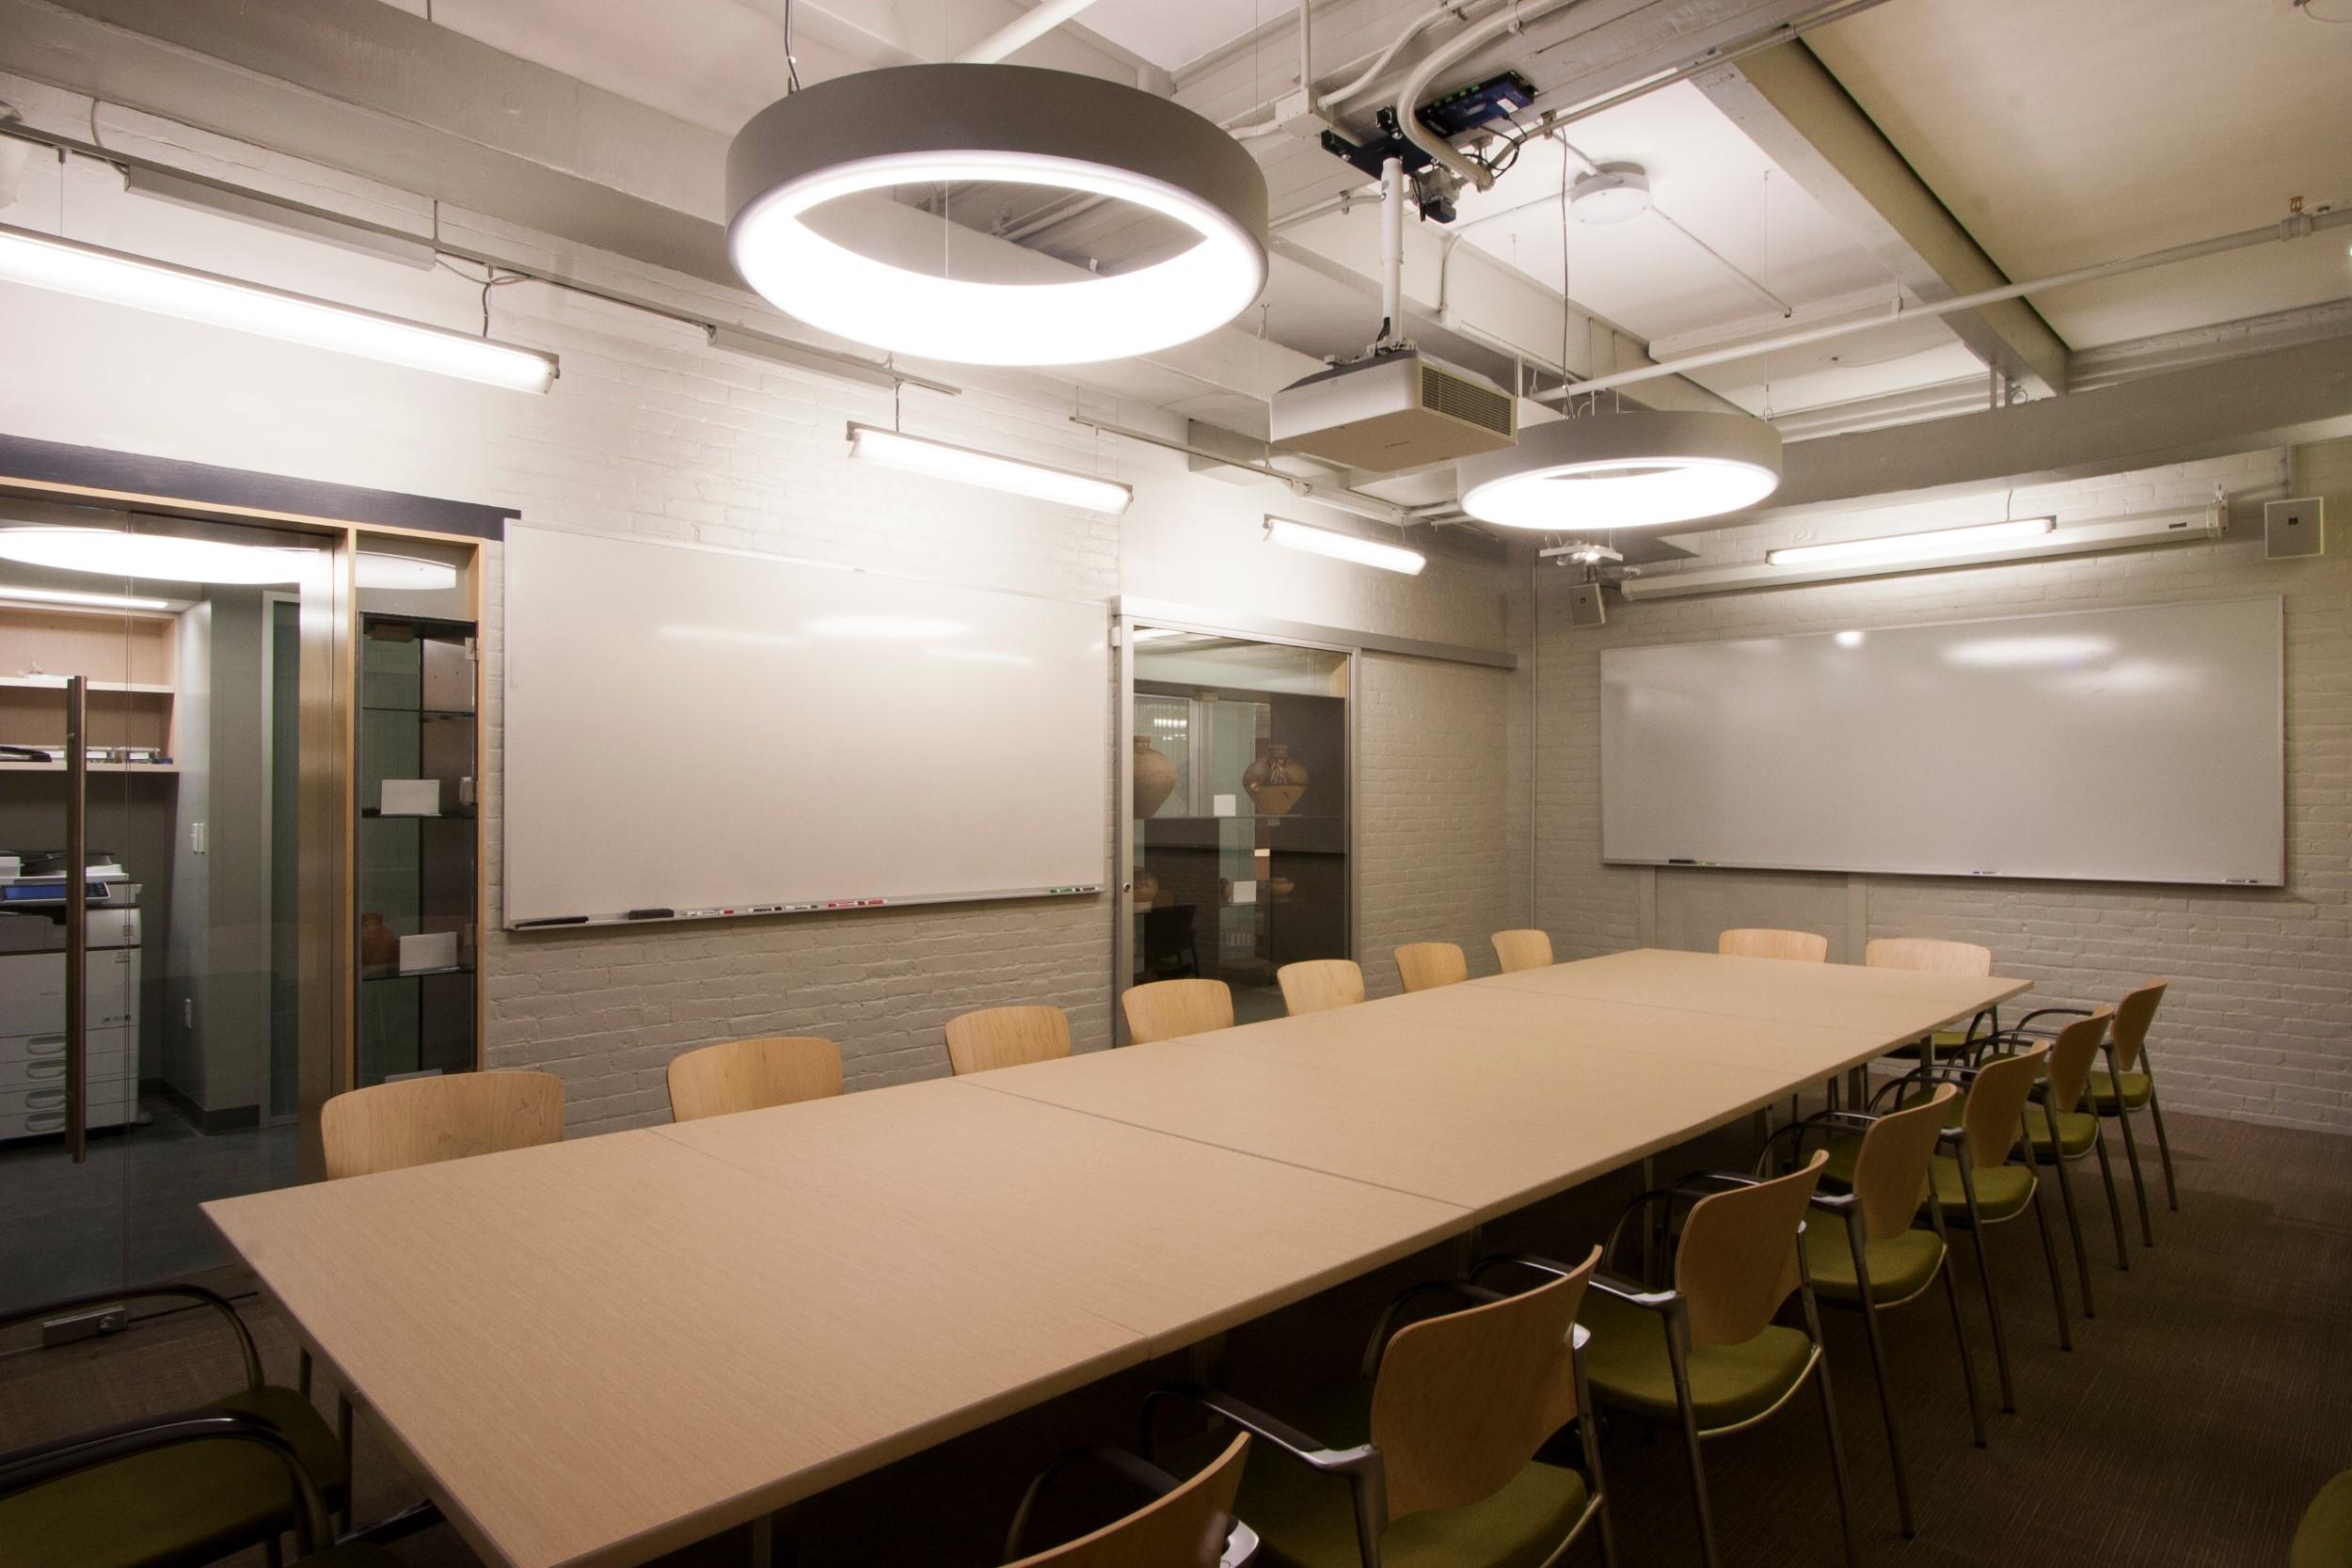 Harvard_University_Corderman_Construction_Anthropology_Department_Meeting_Room.jpg